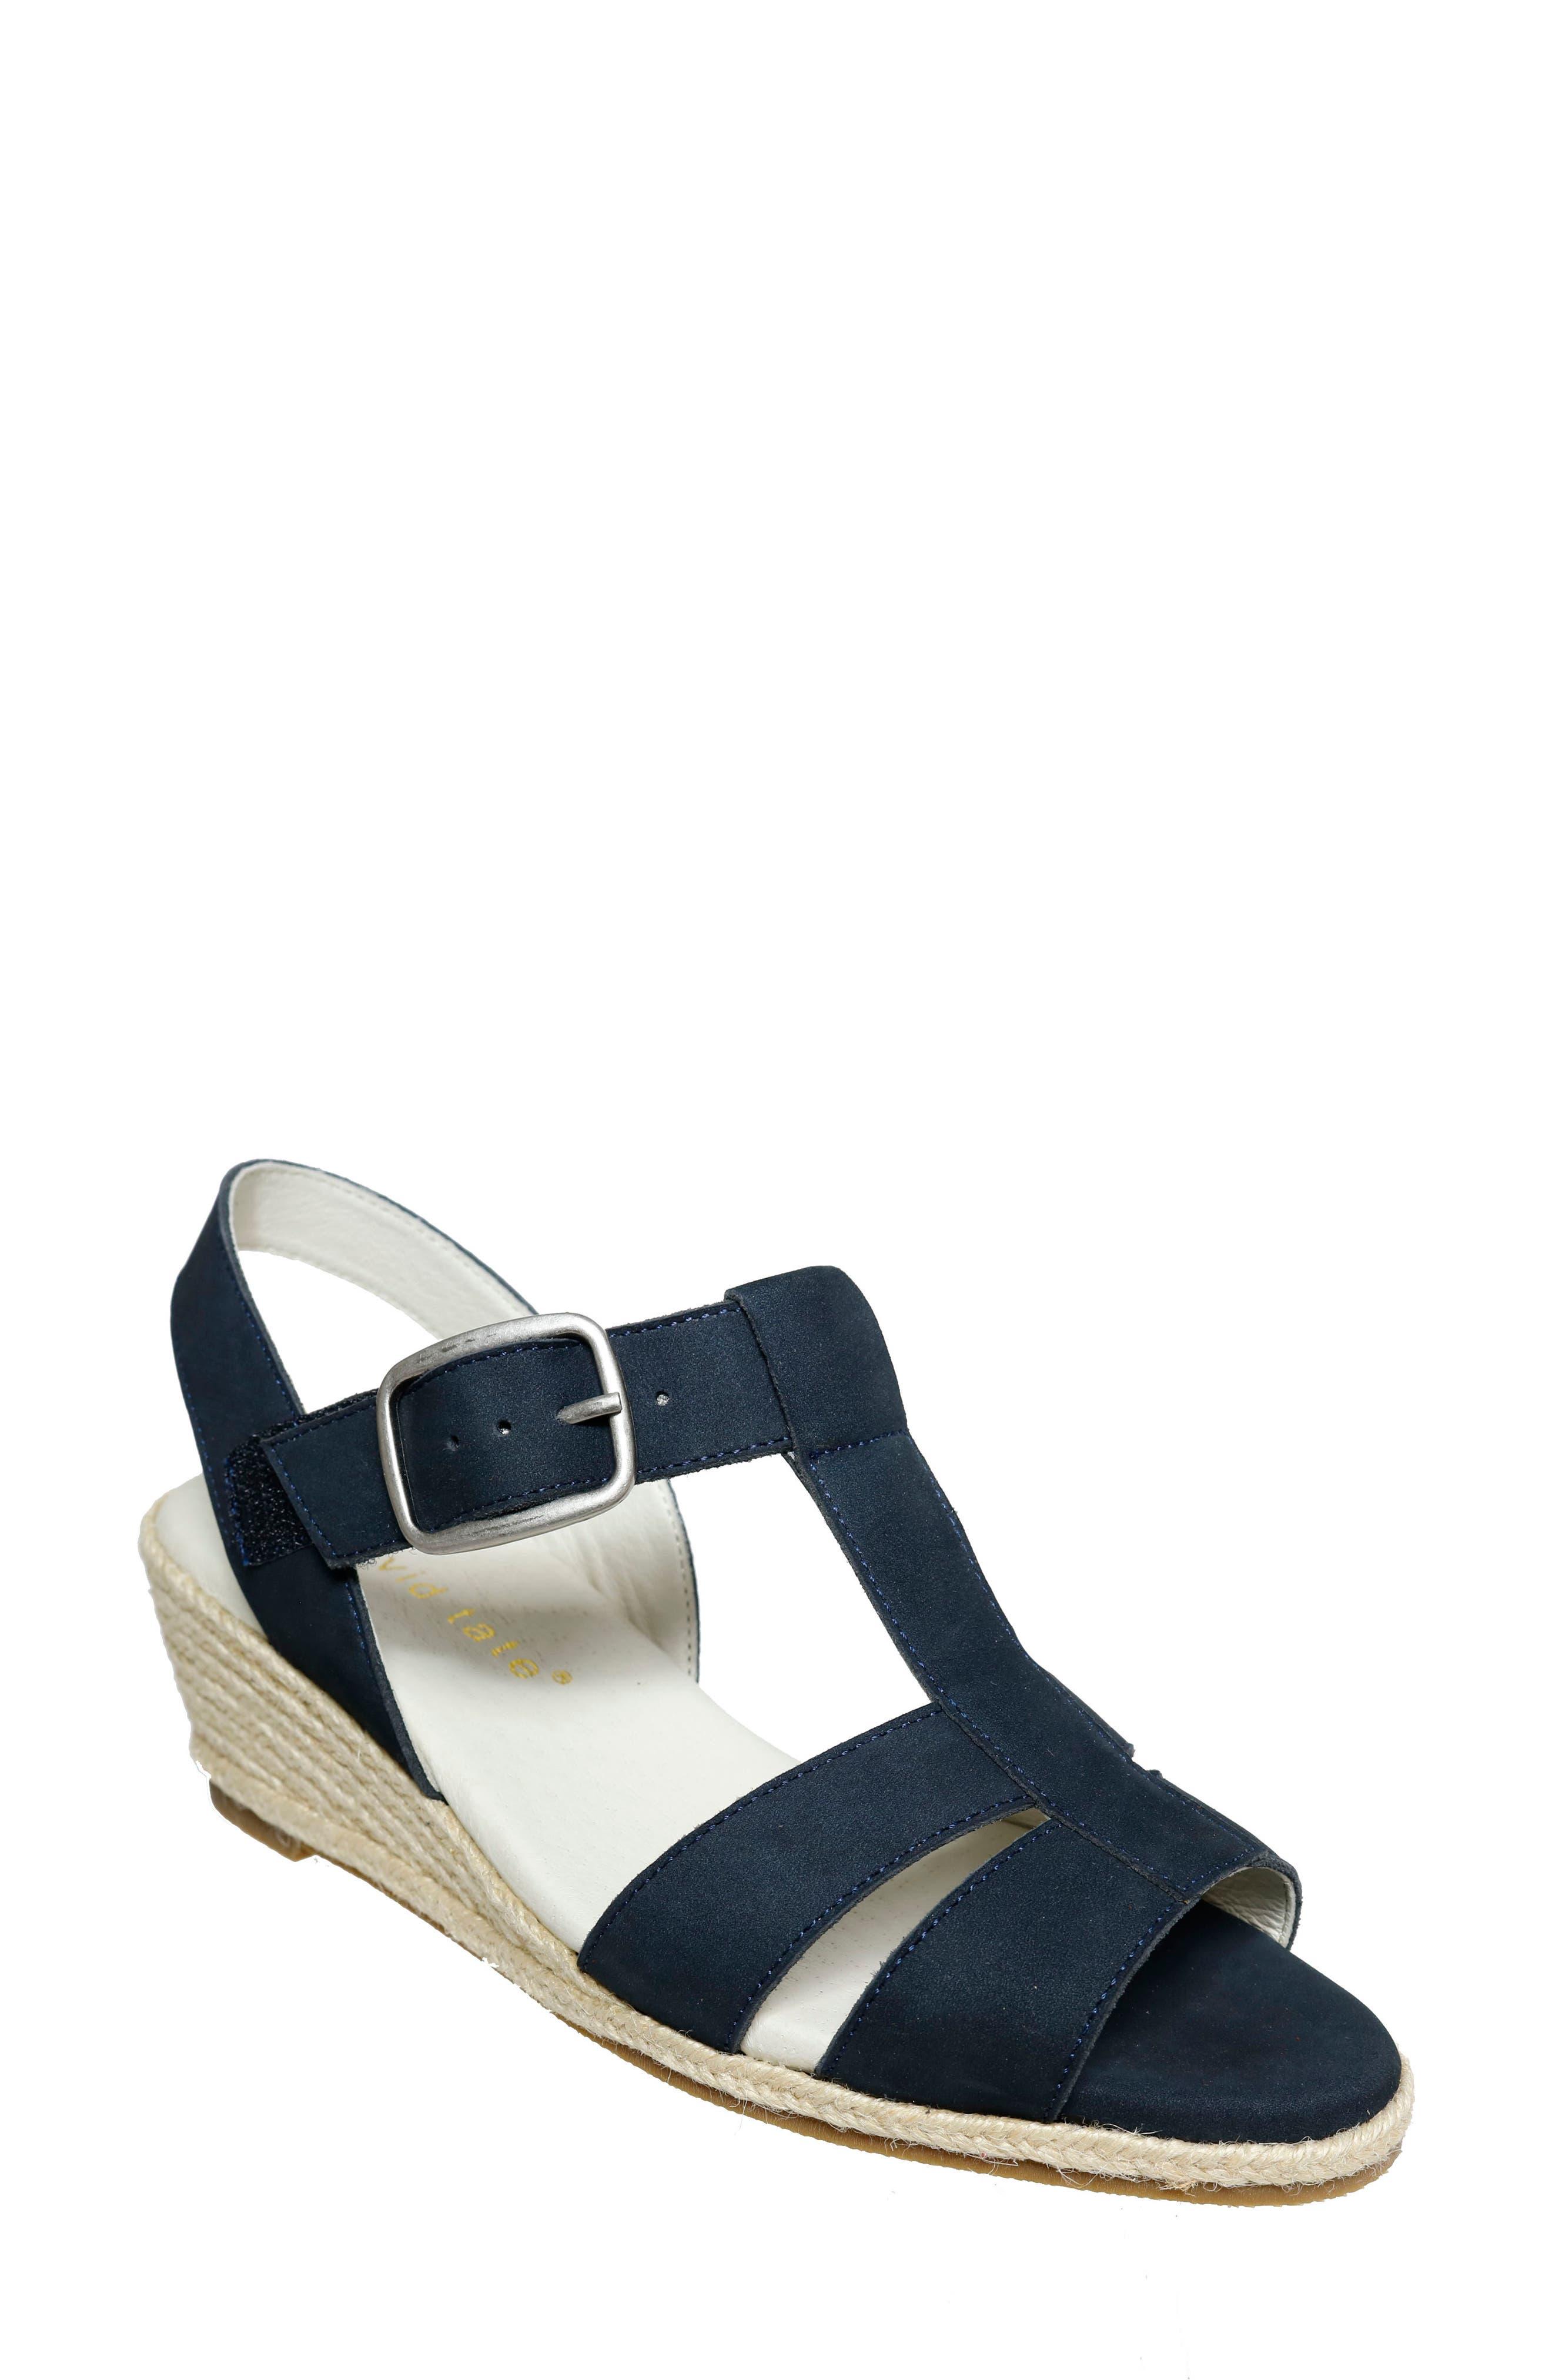 Vacation Espadrille Wedge Sandal